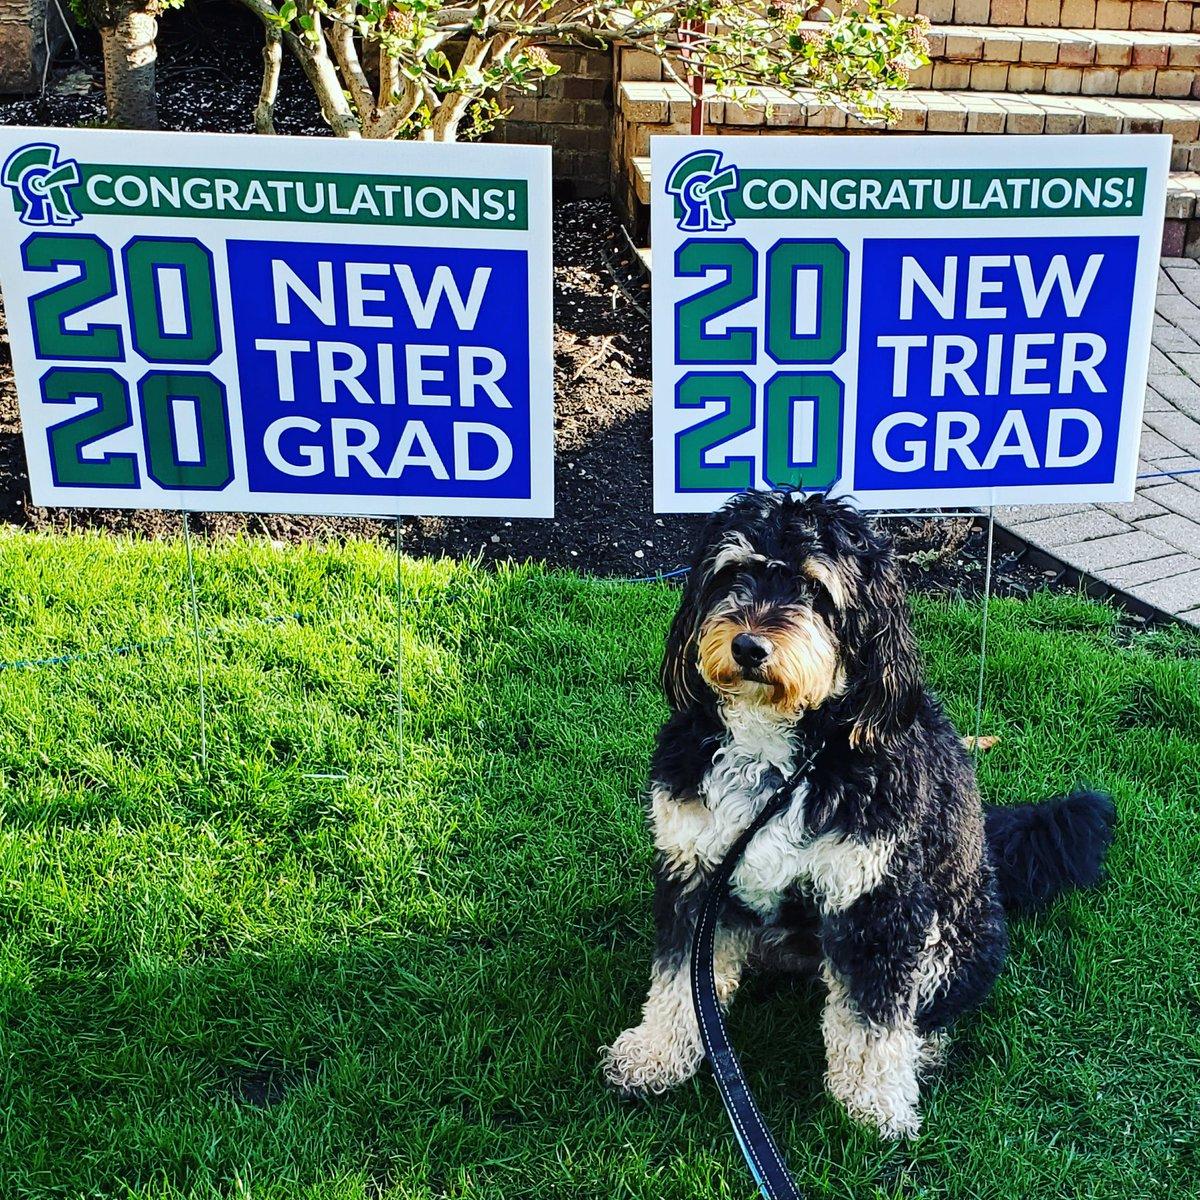 Congrats to the #Classof2020 especially @NewTrier203 ❤️❤️❤️